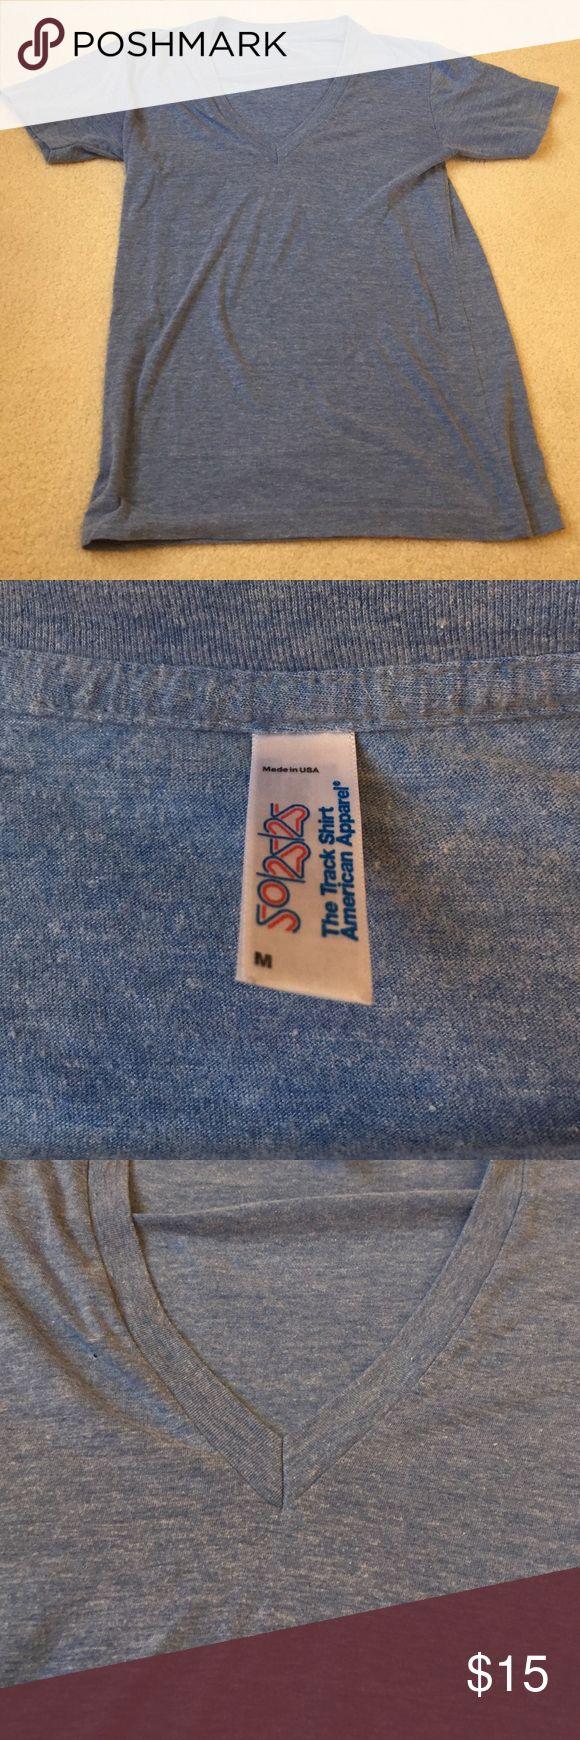 American apparel heather blue Vneck tshirt American apparel. Vneck. Sky/heather/light blue. Lightly worn. Soft! American Apparel Tops Tees - Short Sleeve